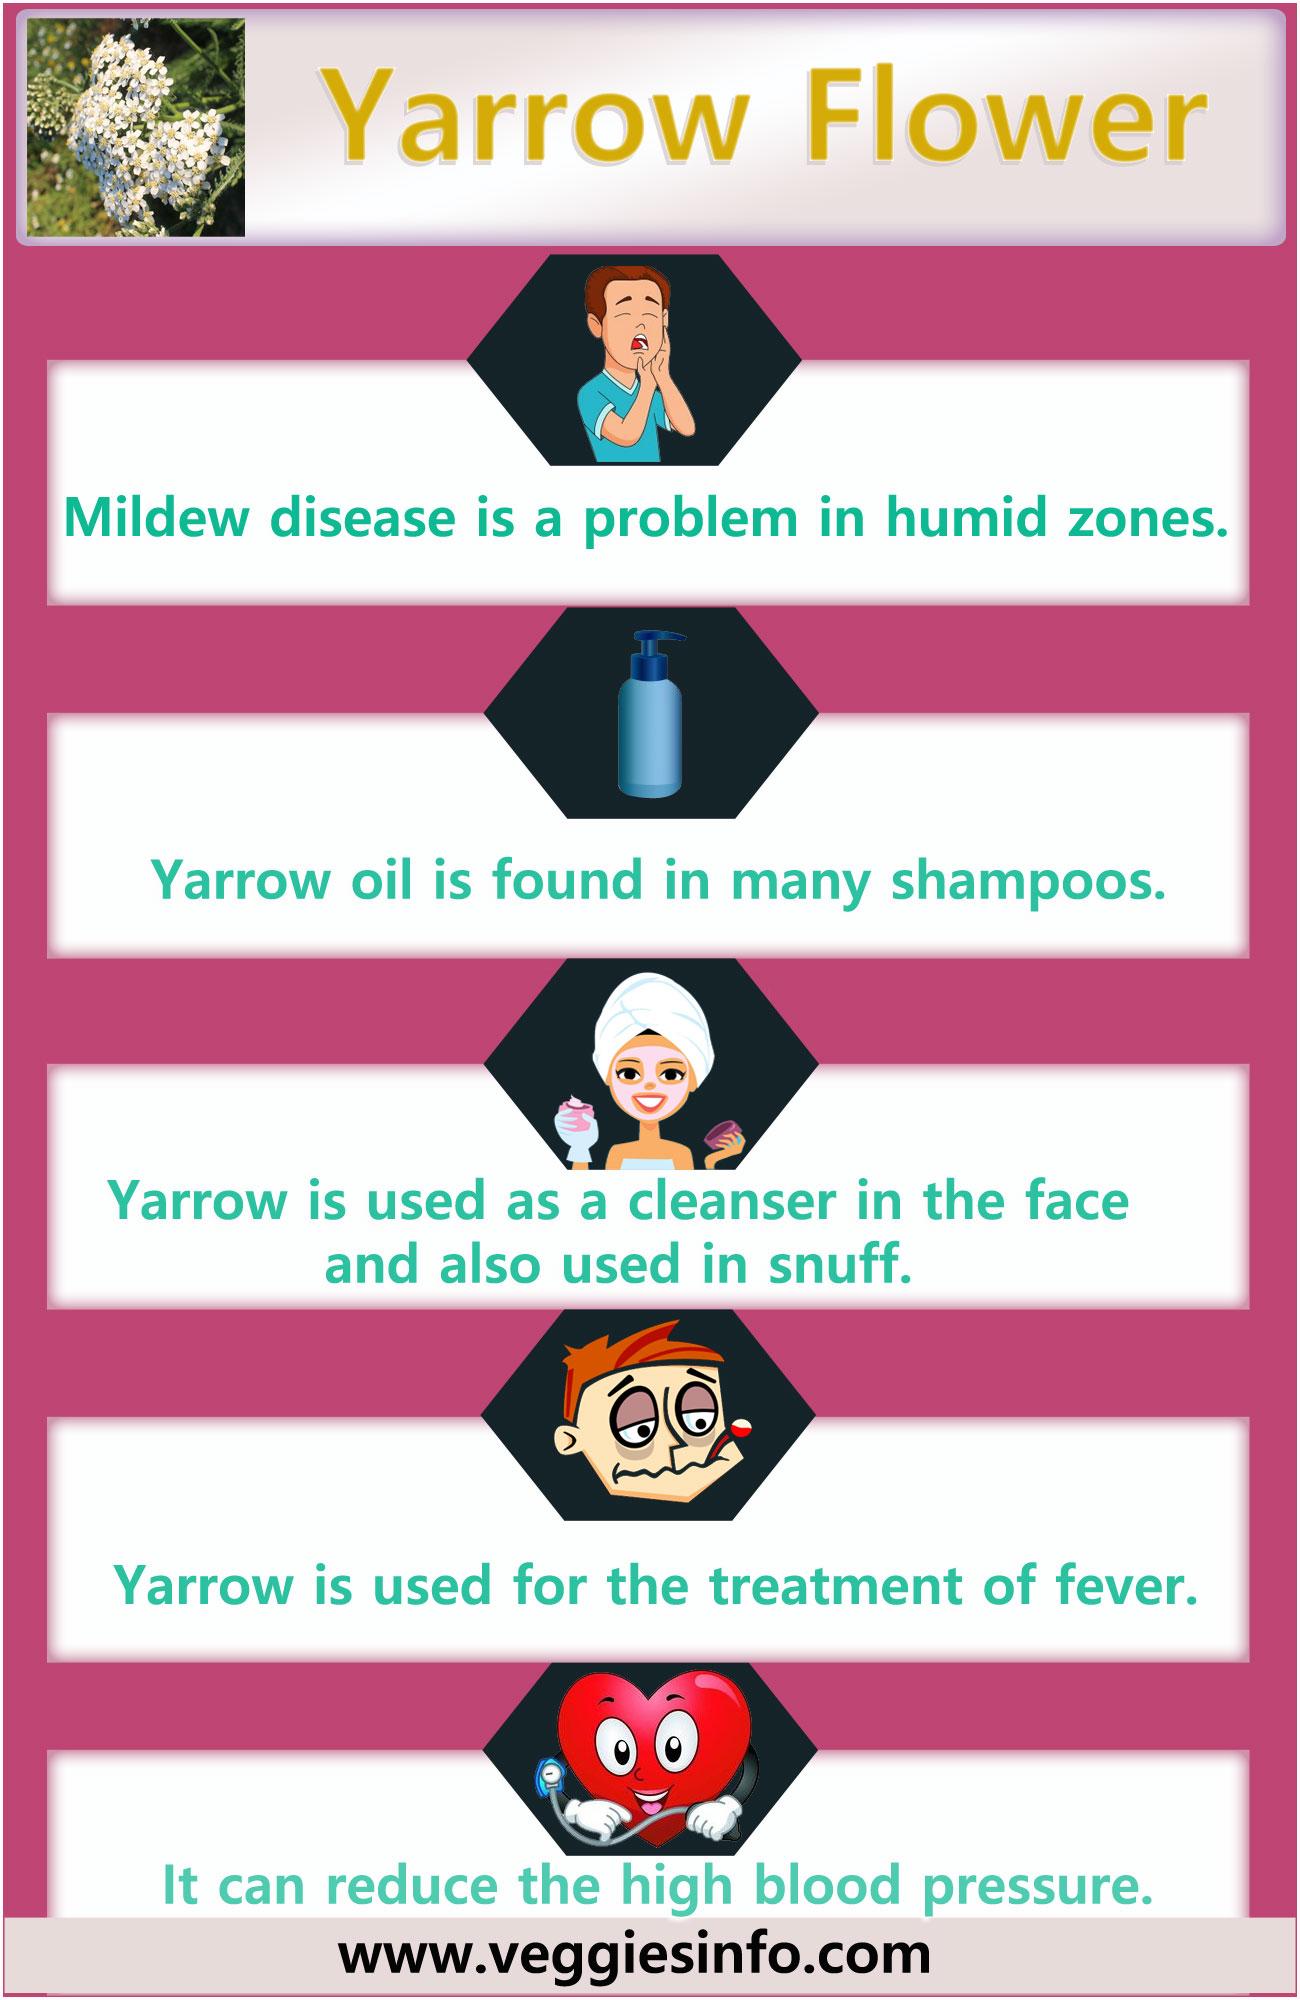 Yarrow Flower Health Benefits